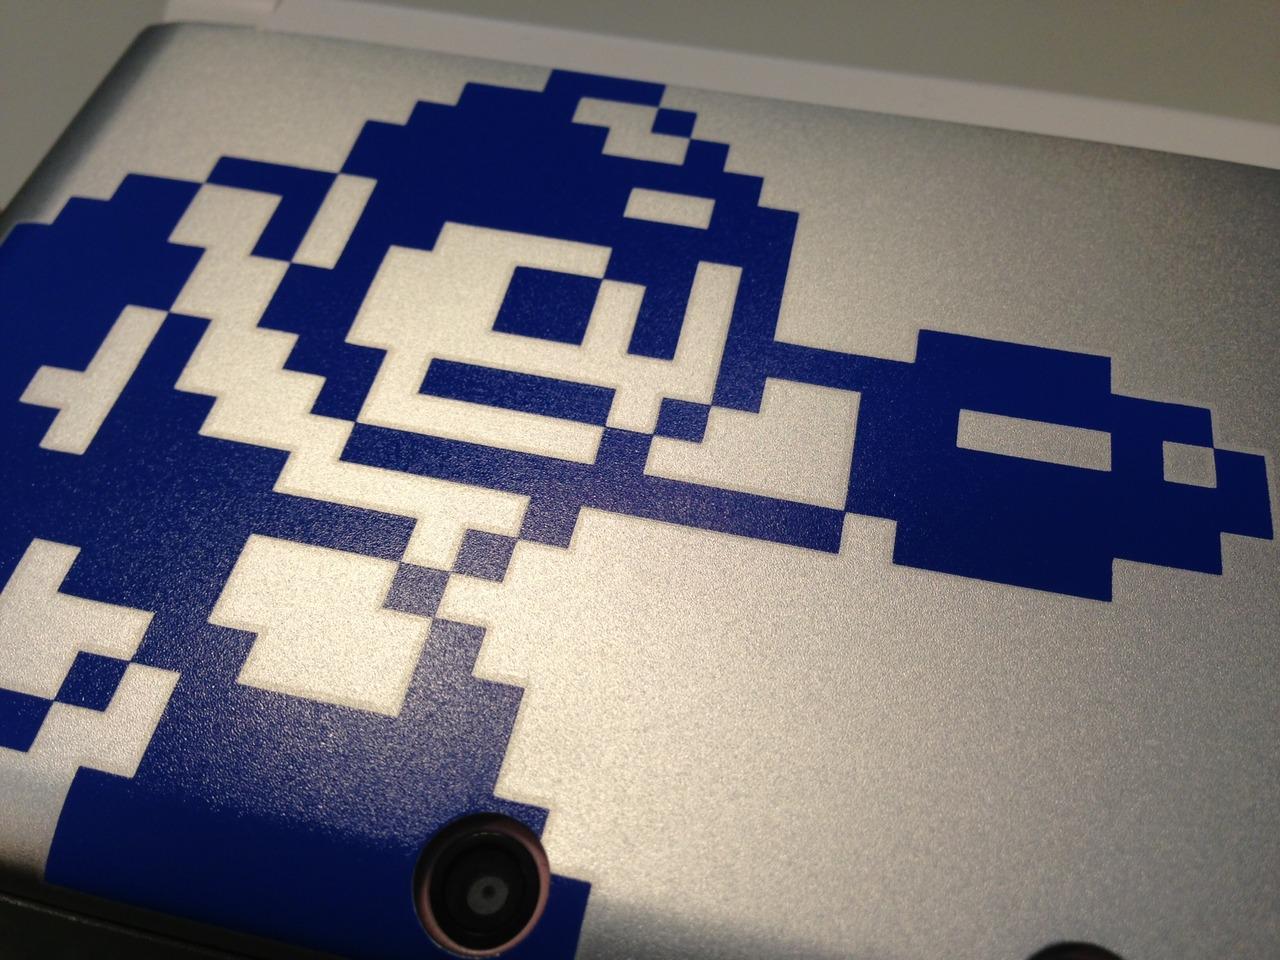 Mega Man 25th anniversary 3DS case  30-04-13 003